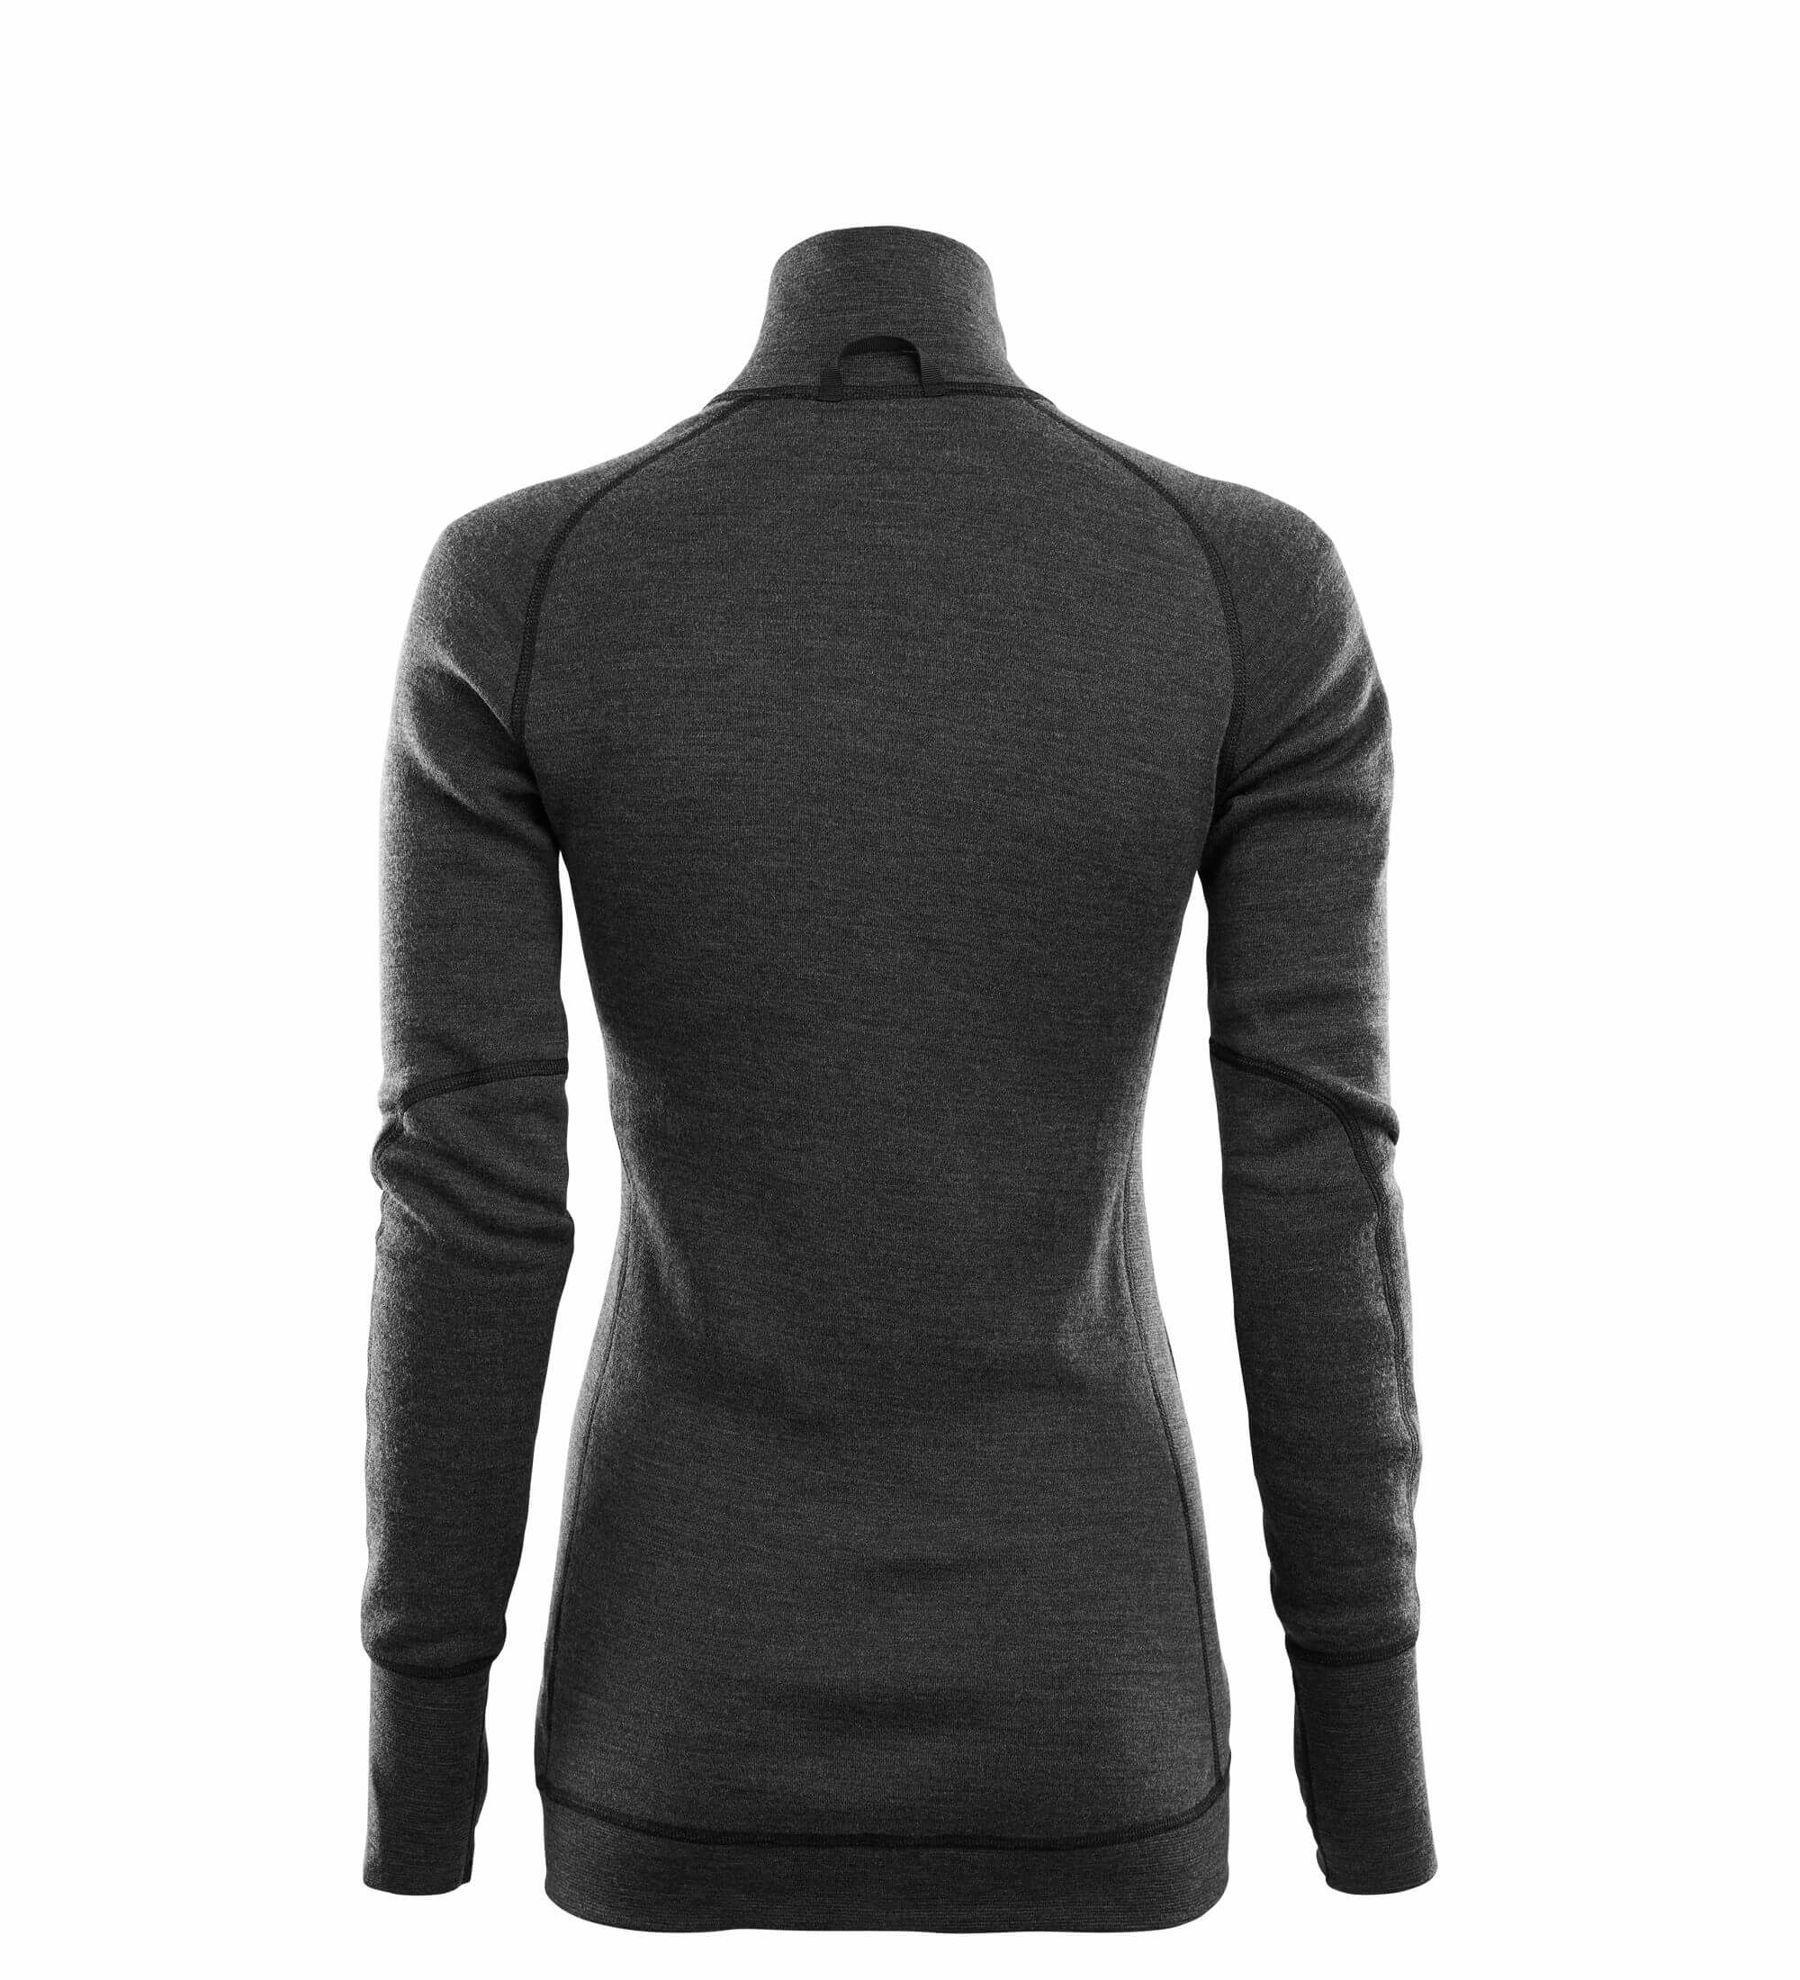 Bilde av DoubleWool Polo Shirt zip, Woman